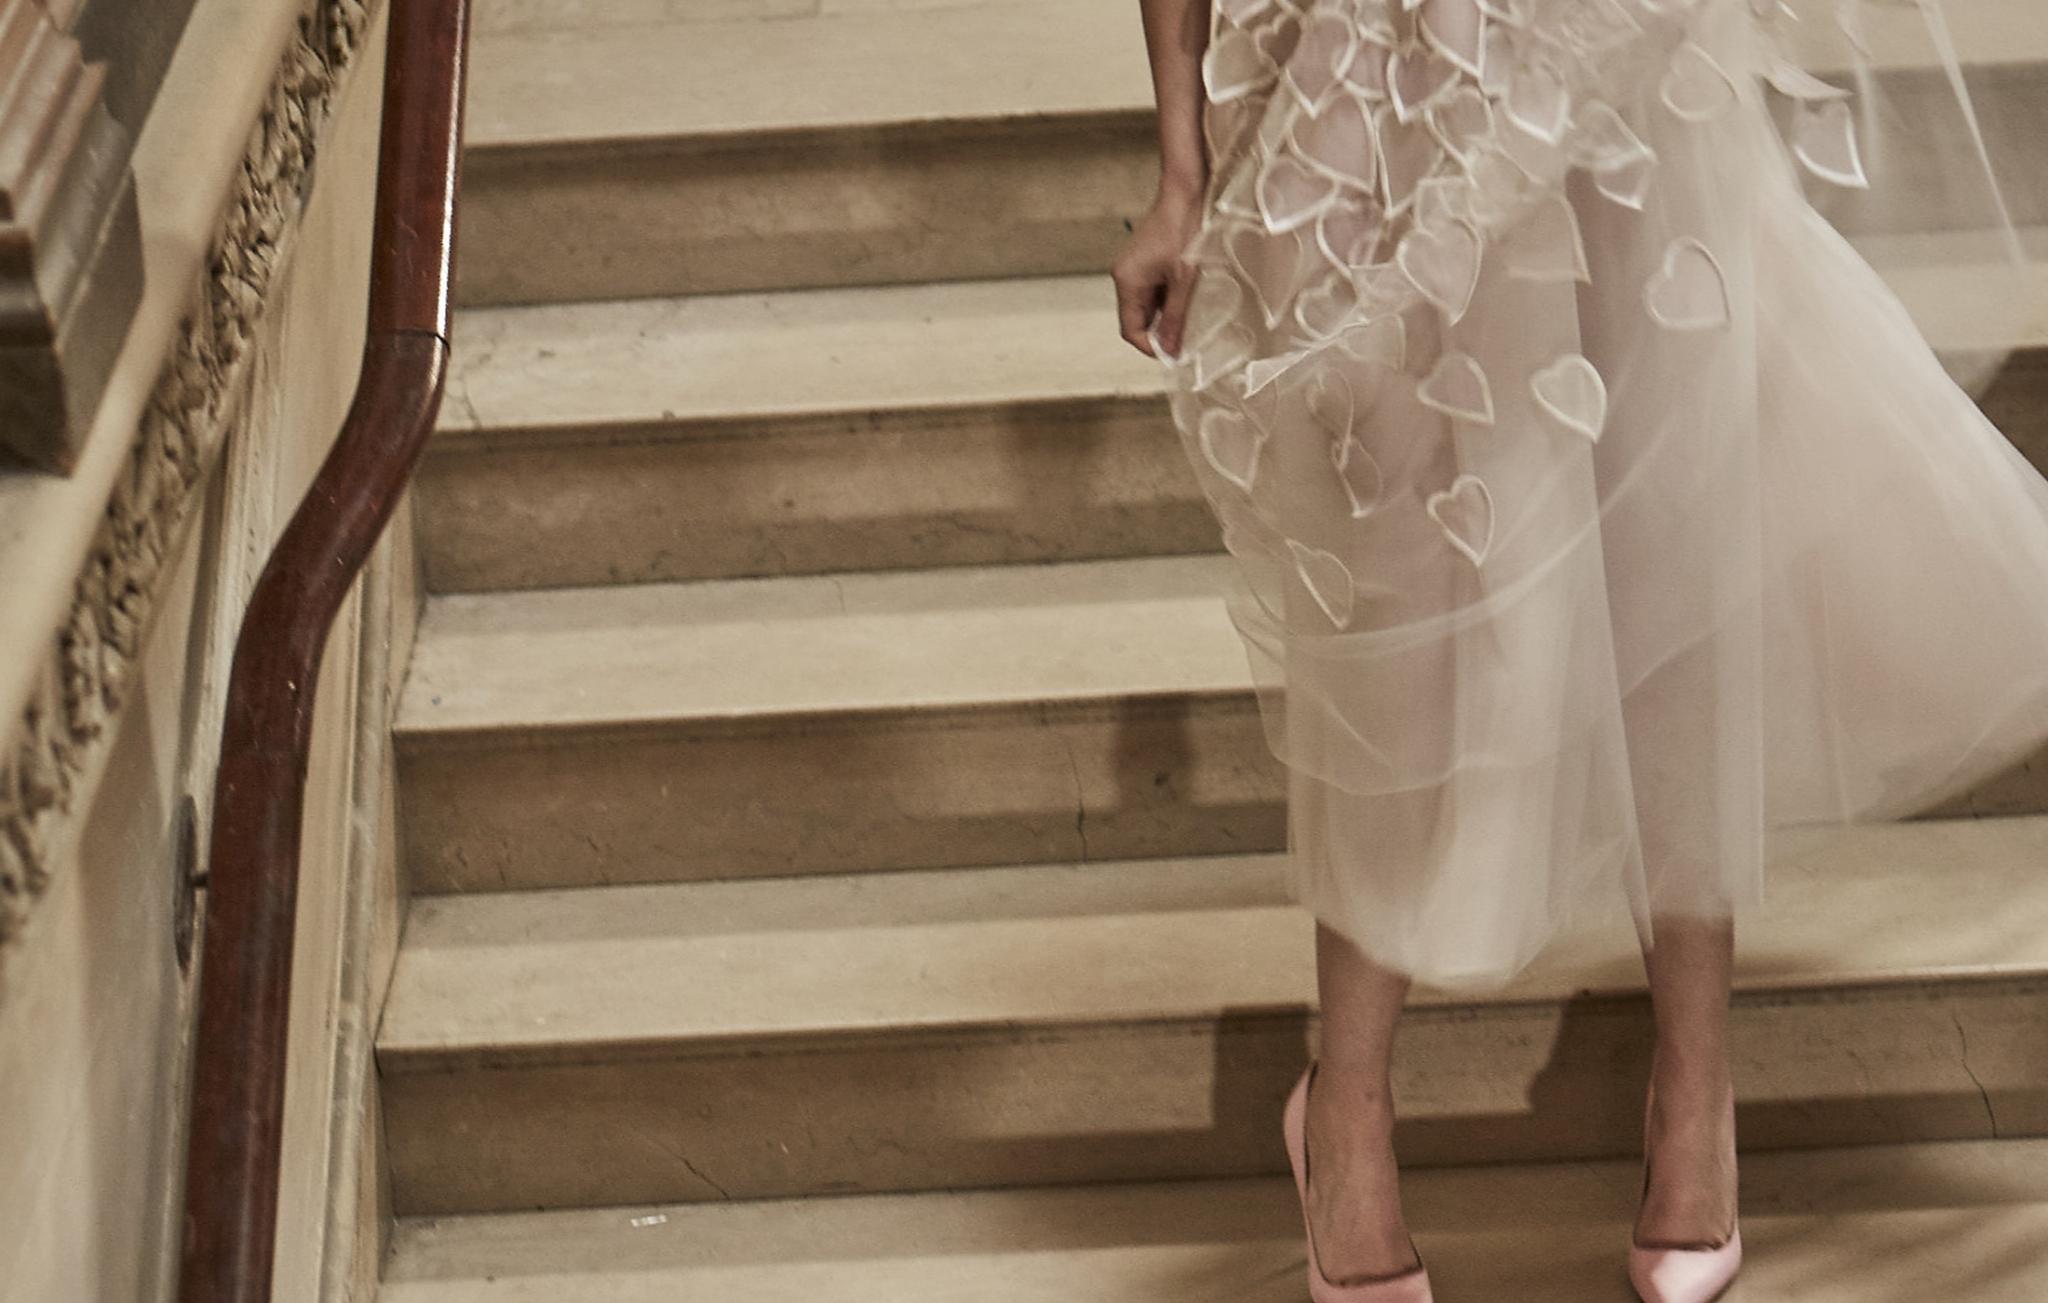 Carolina Herrera – Spring 2019